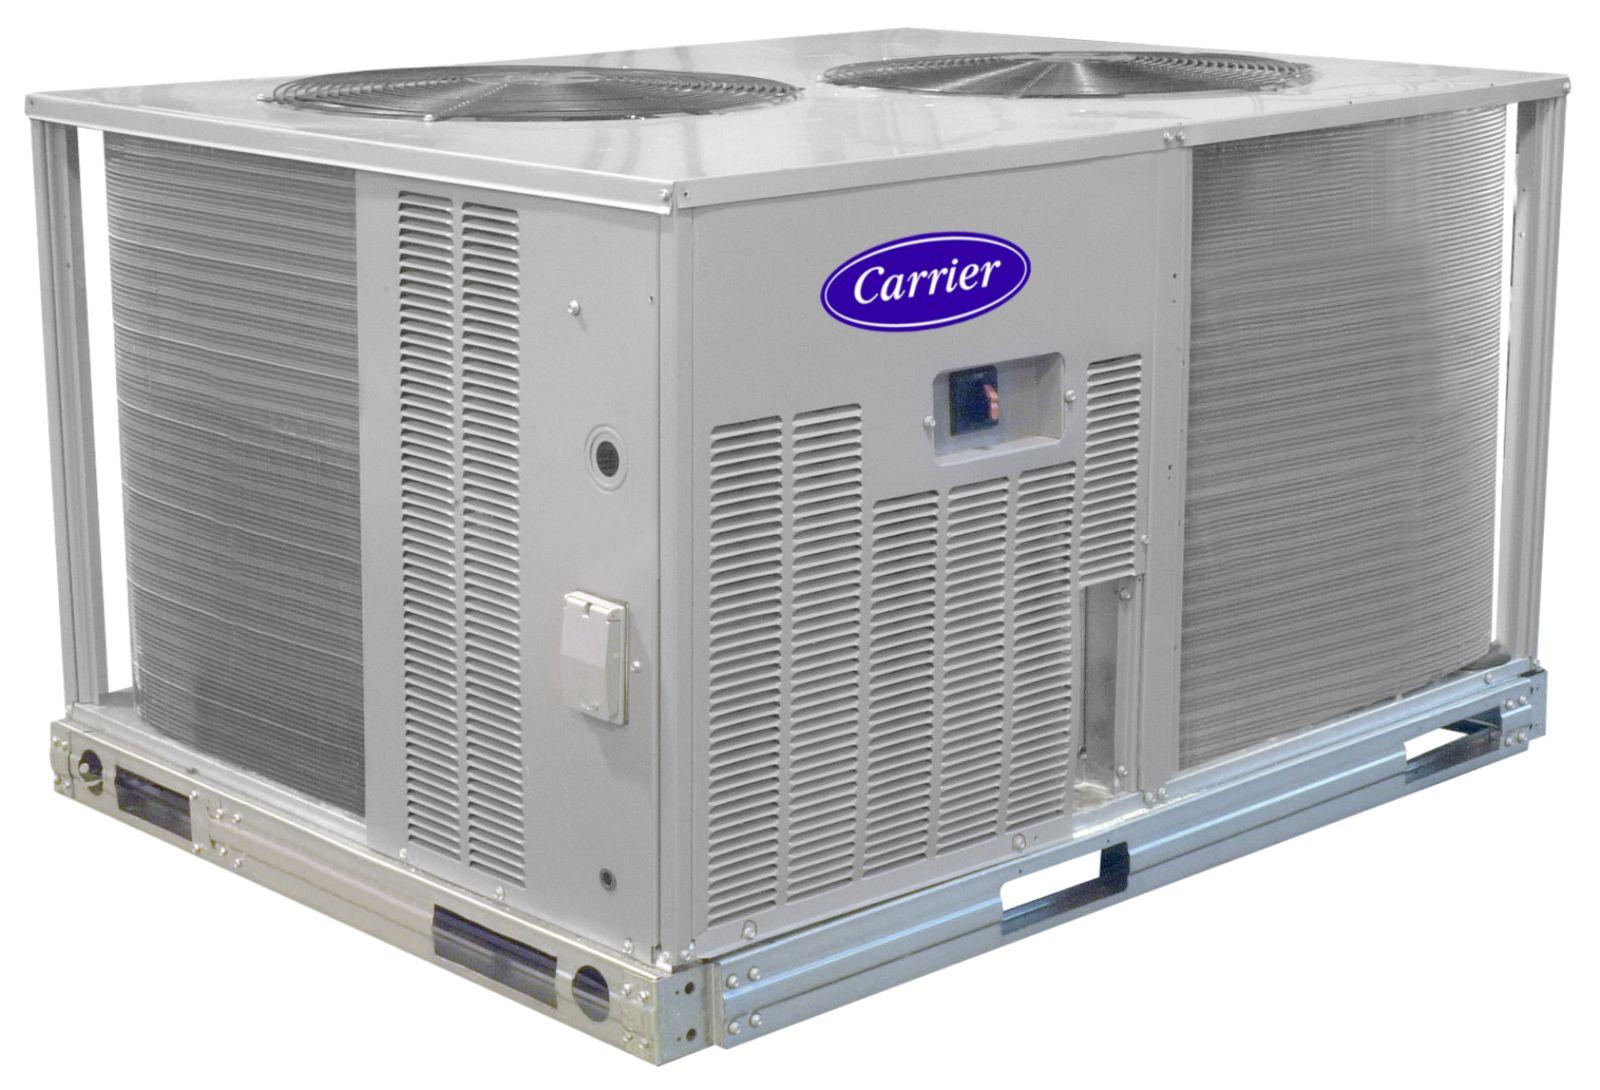 carrier 40ruaa08a2a6-0a0a0 heat pump - commercial air handlers